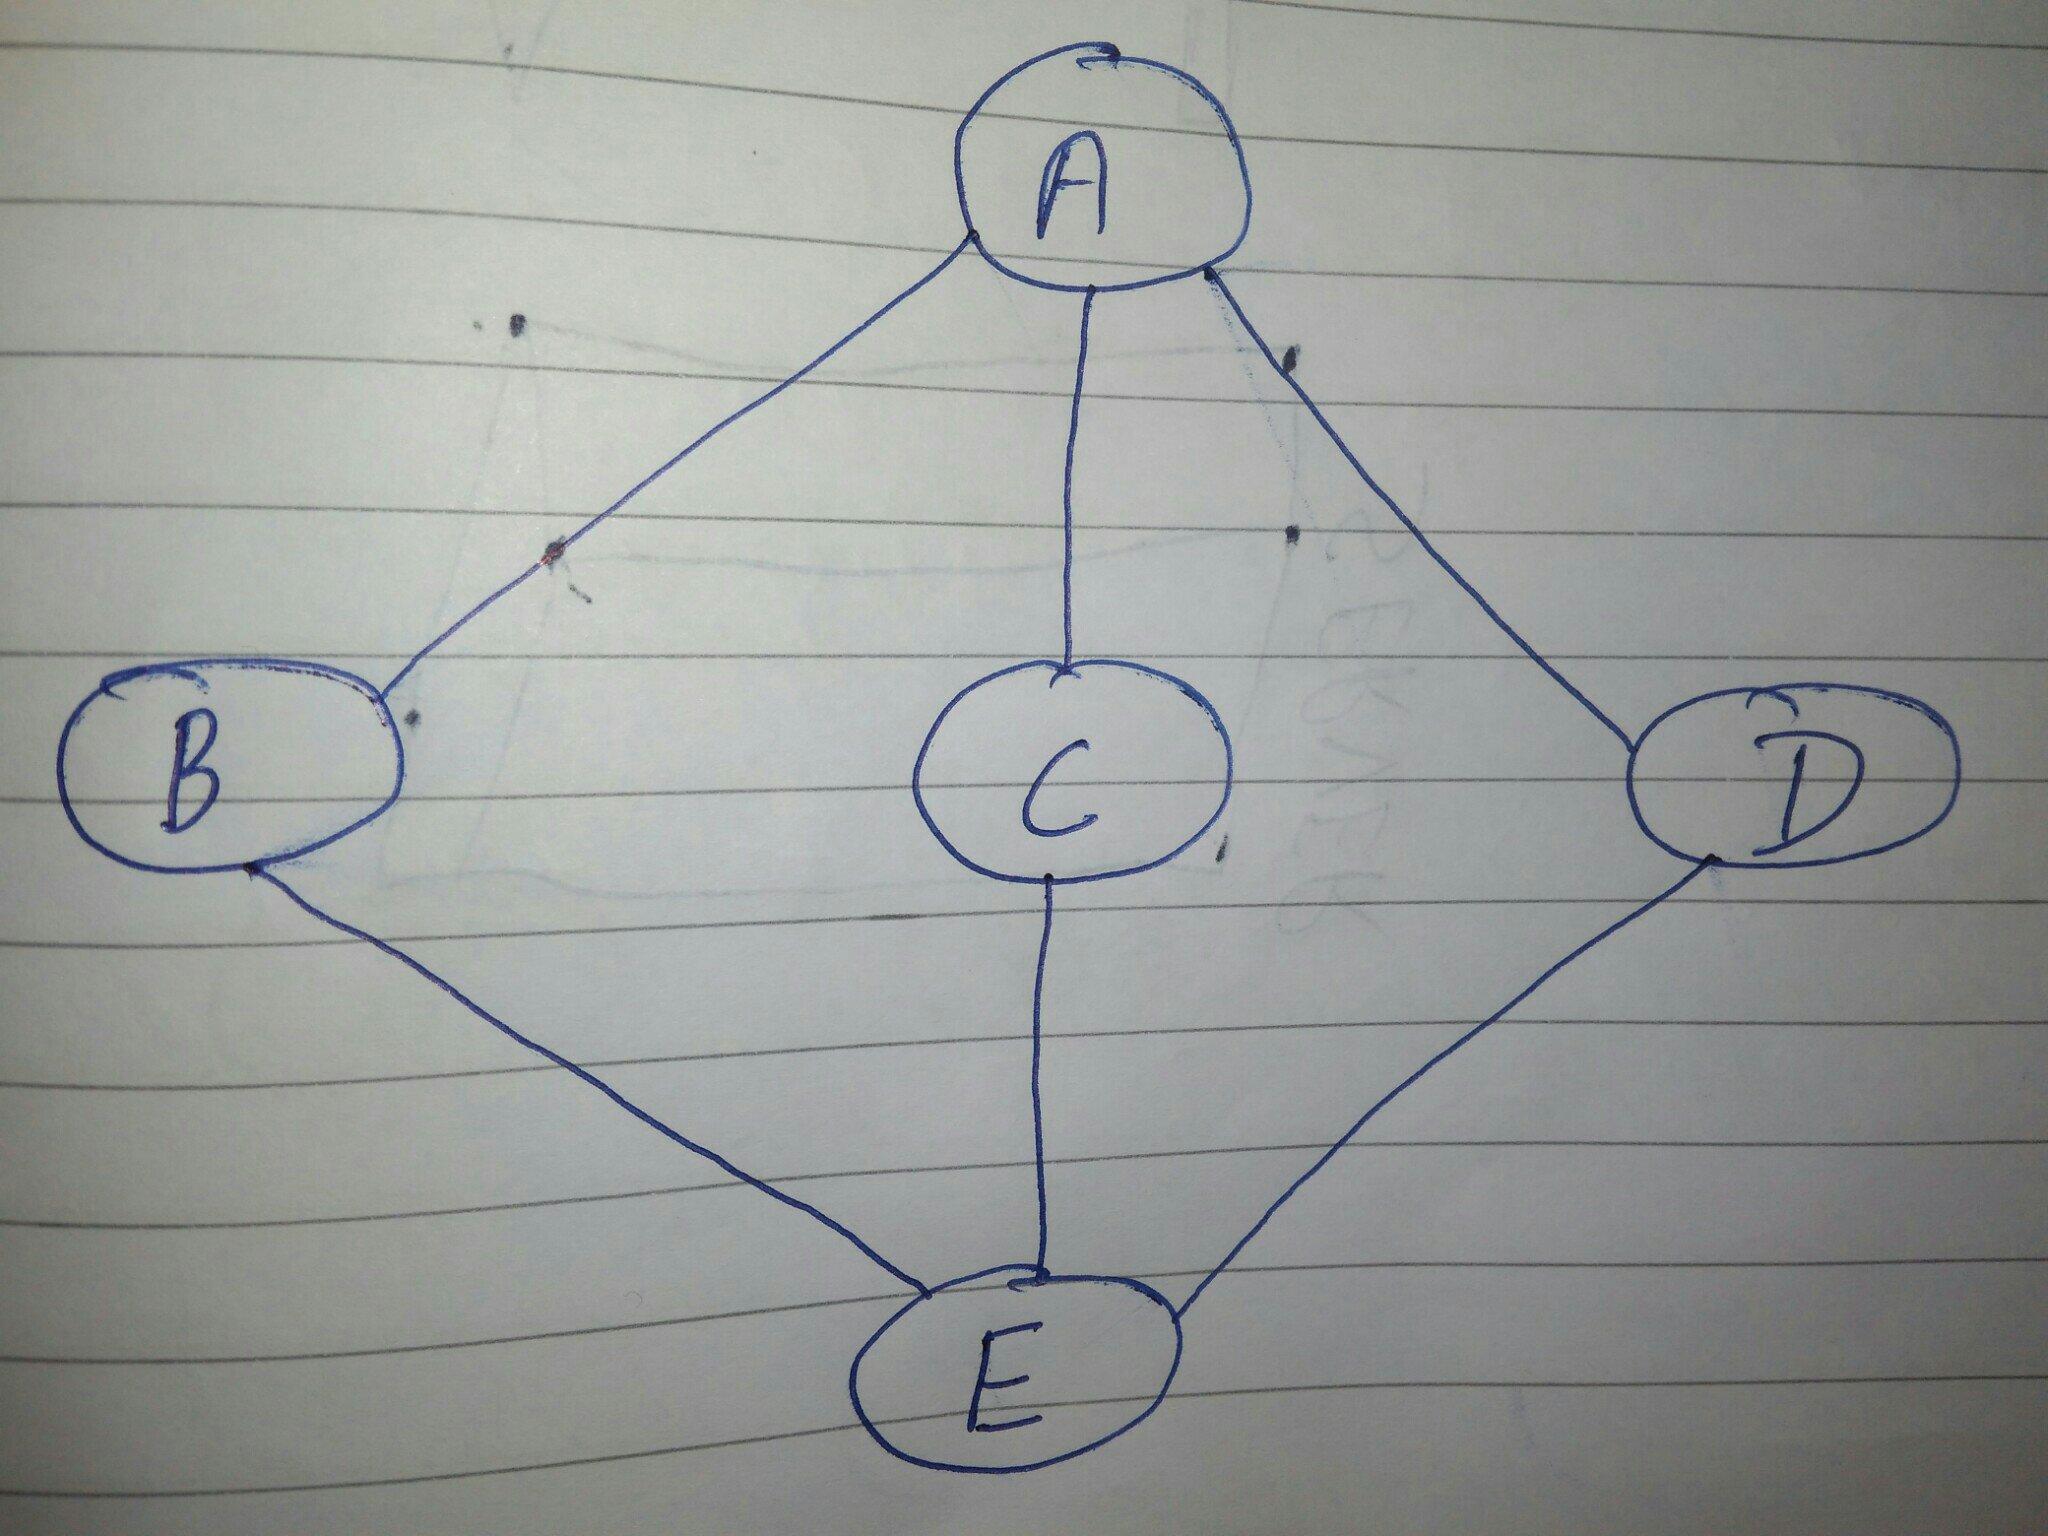 Bfs algorithm example